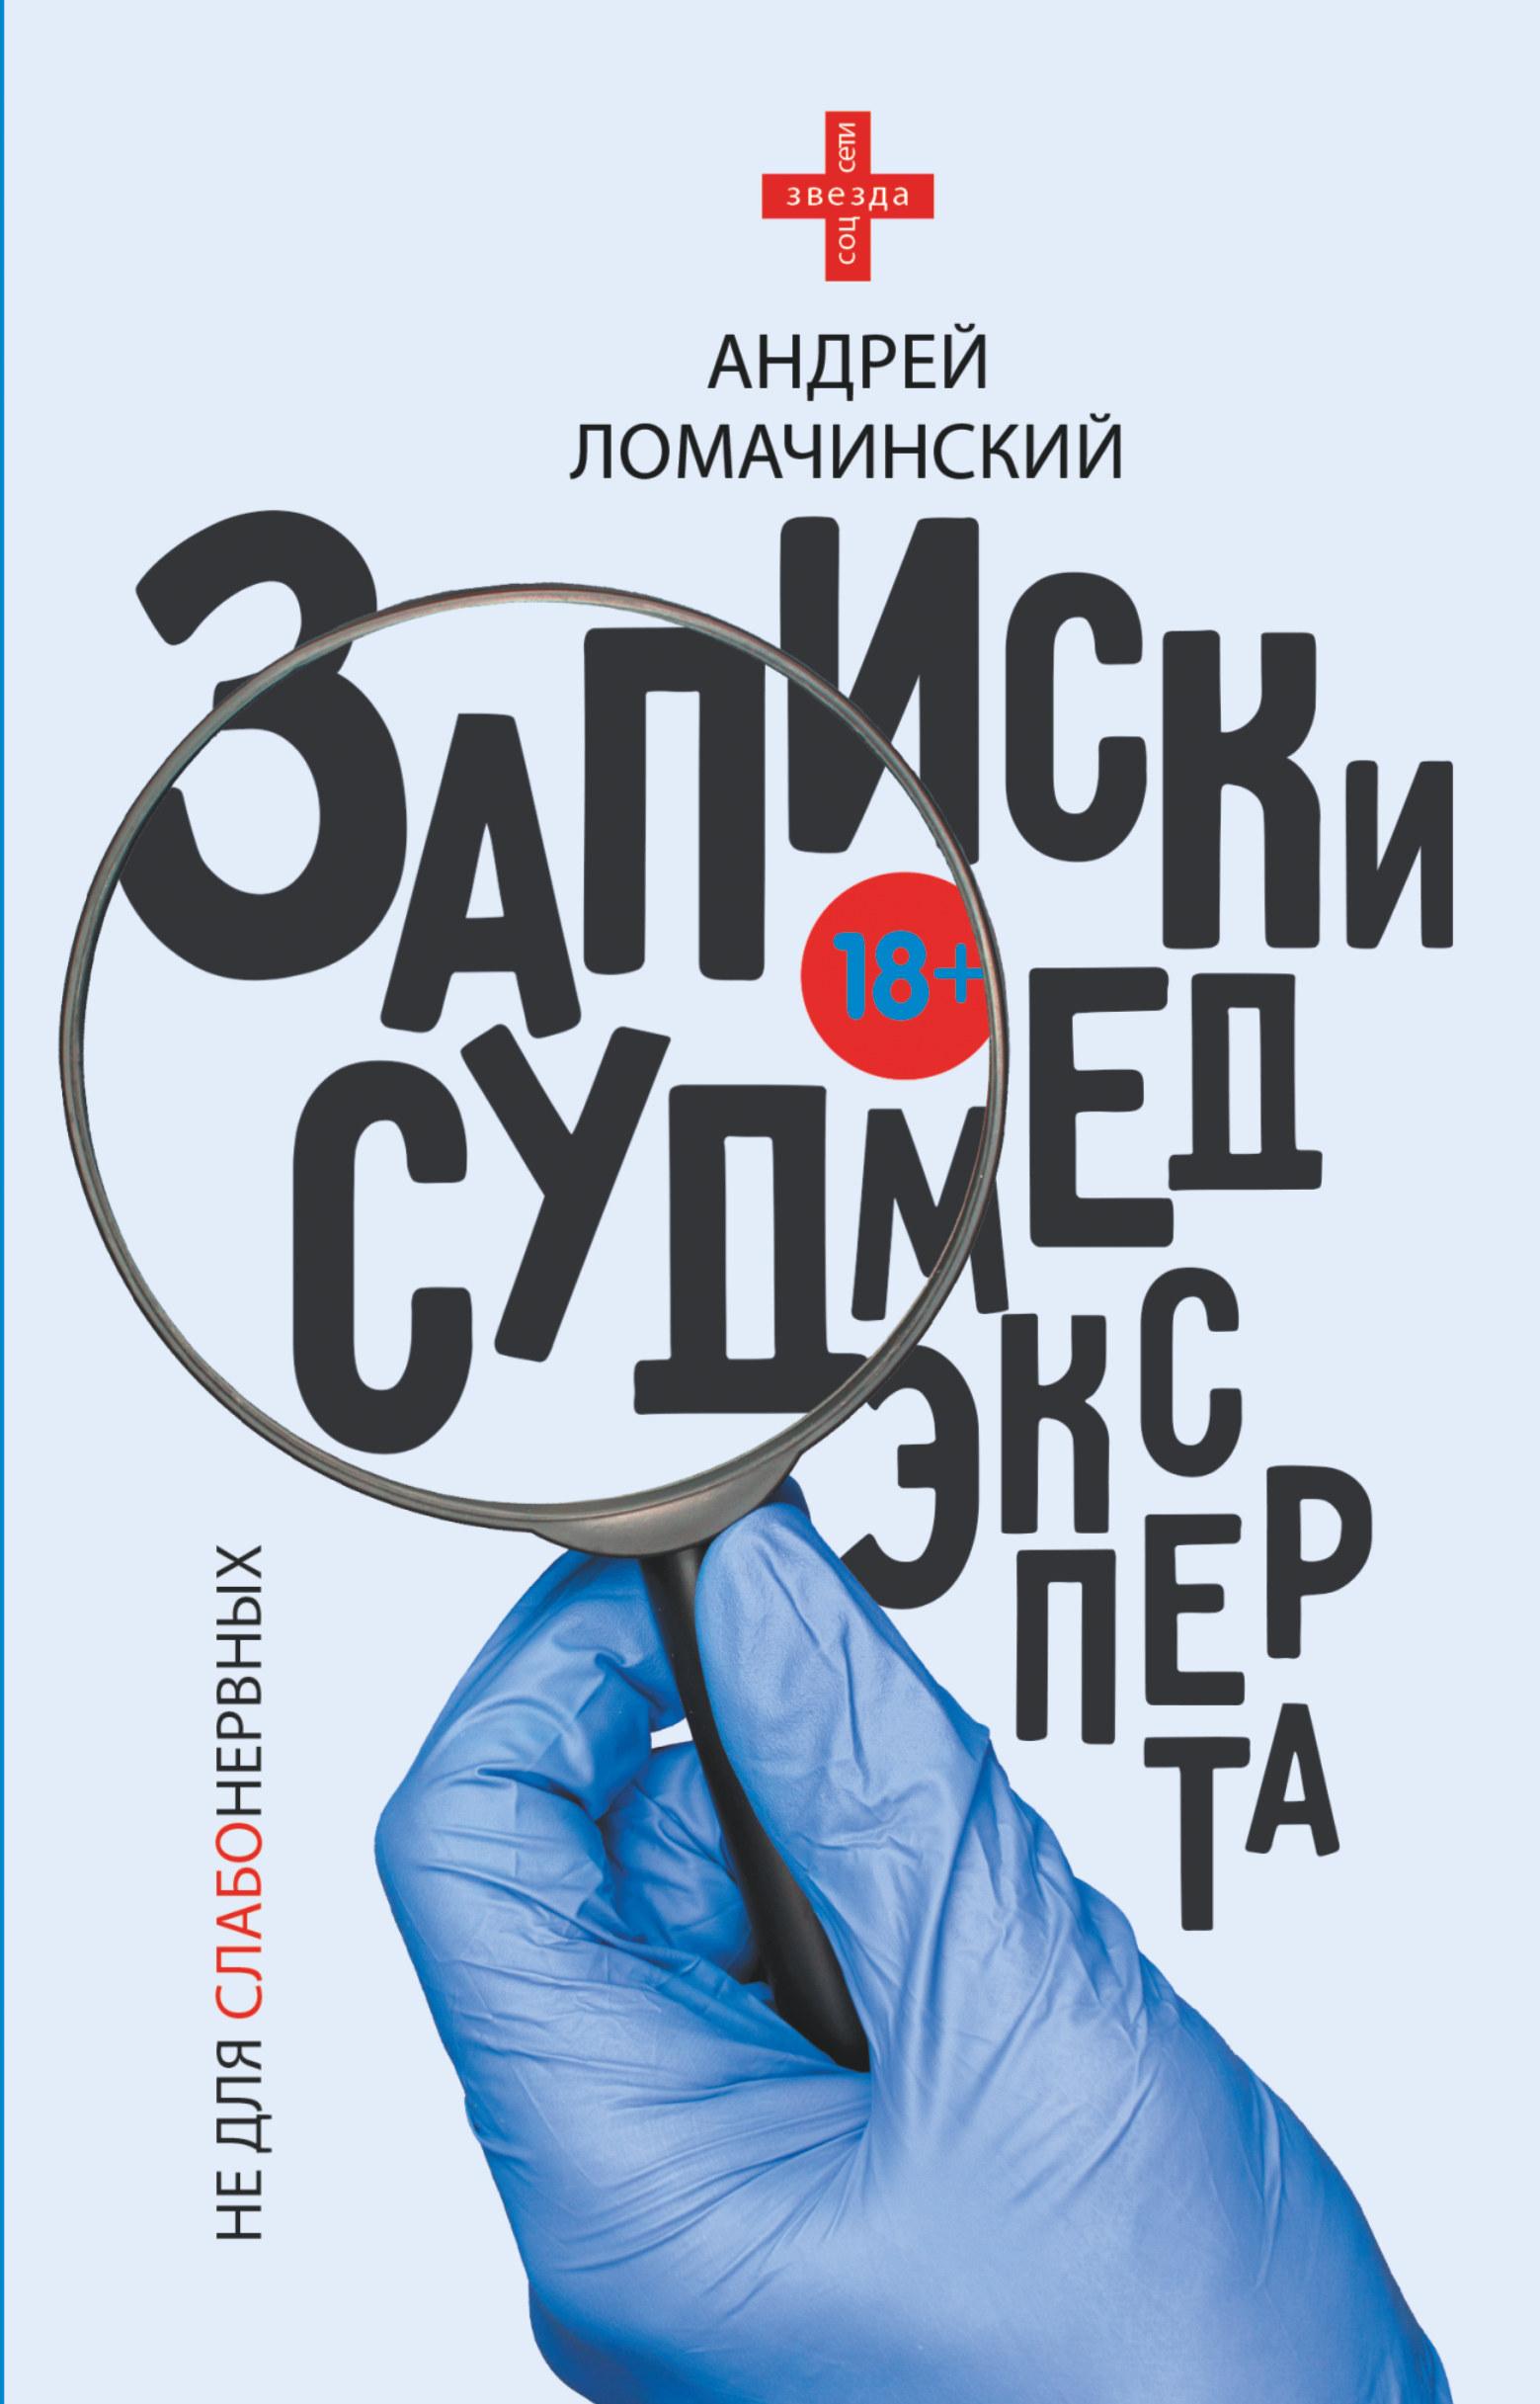 Андрей Ломачинский Записки судмедэксперта